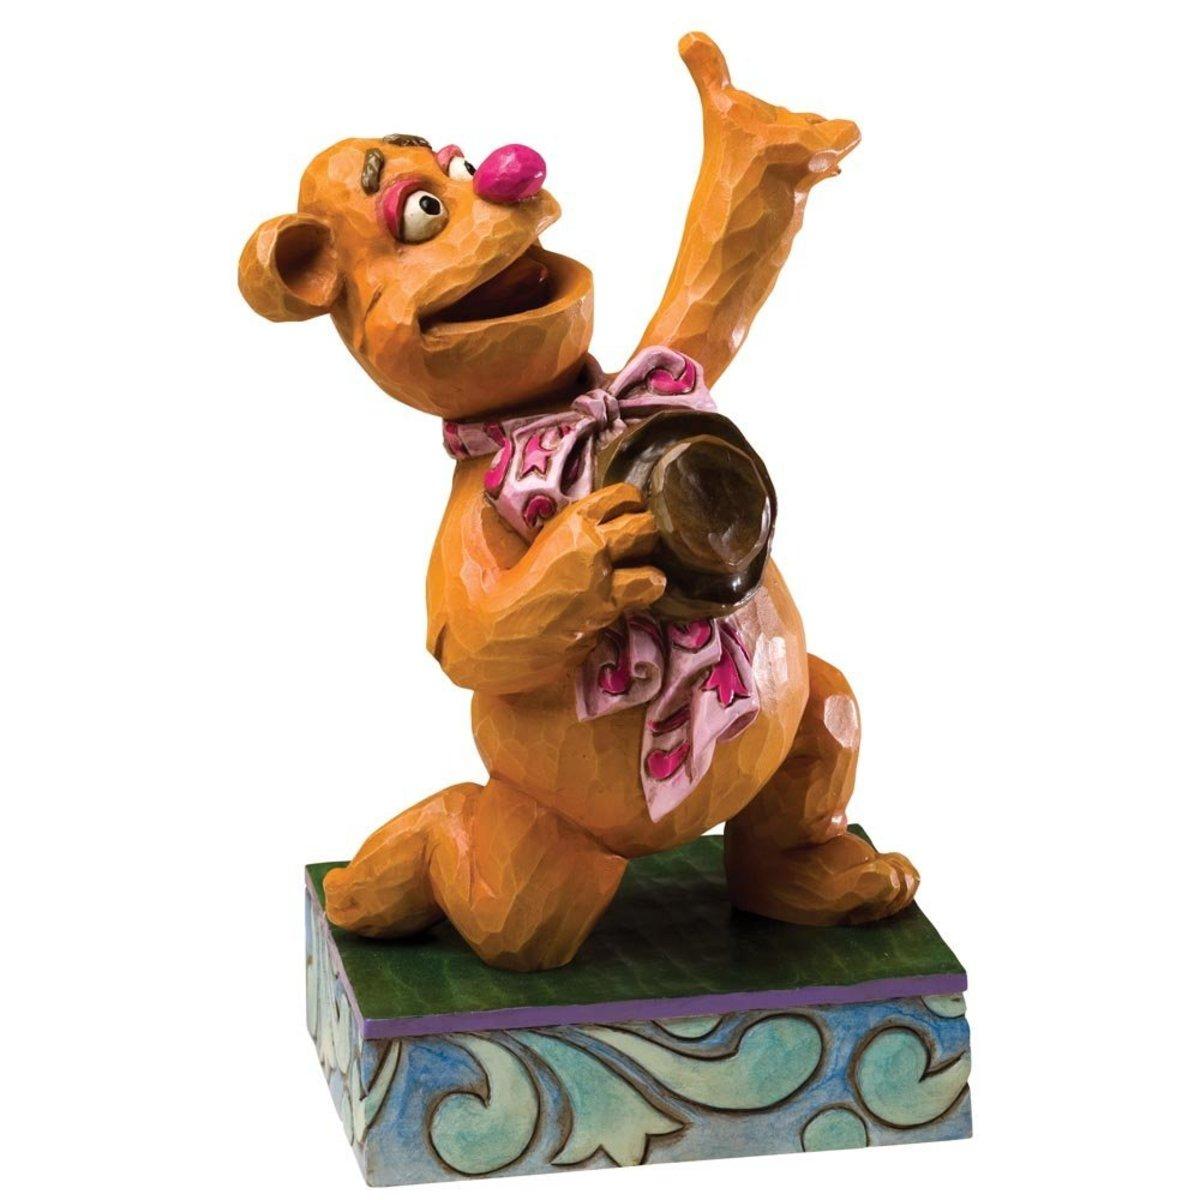 Jim Shore's Fozzie Bear Ornament